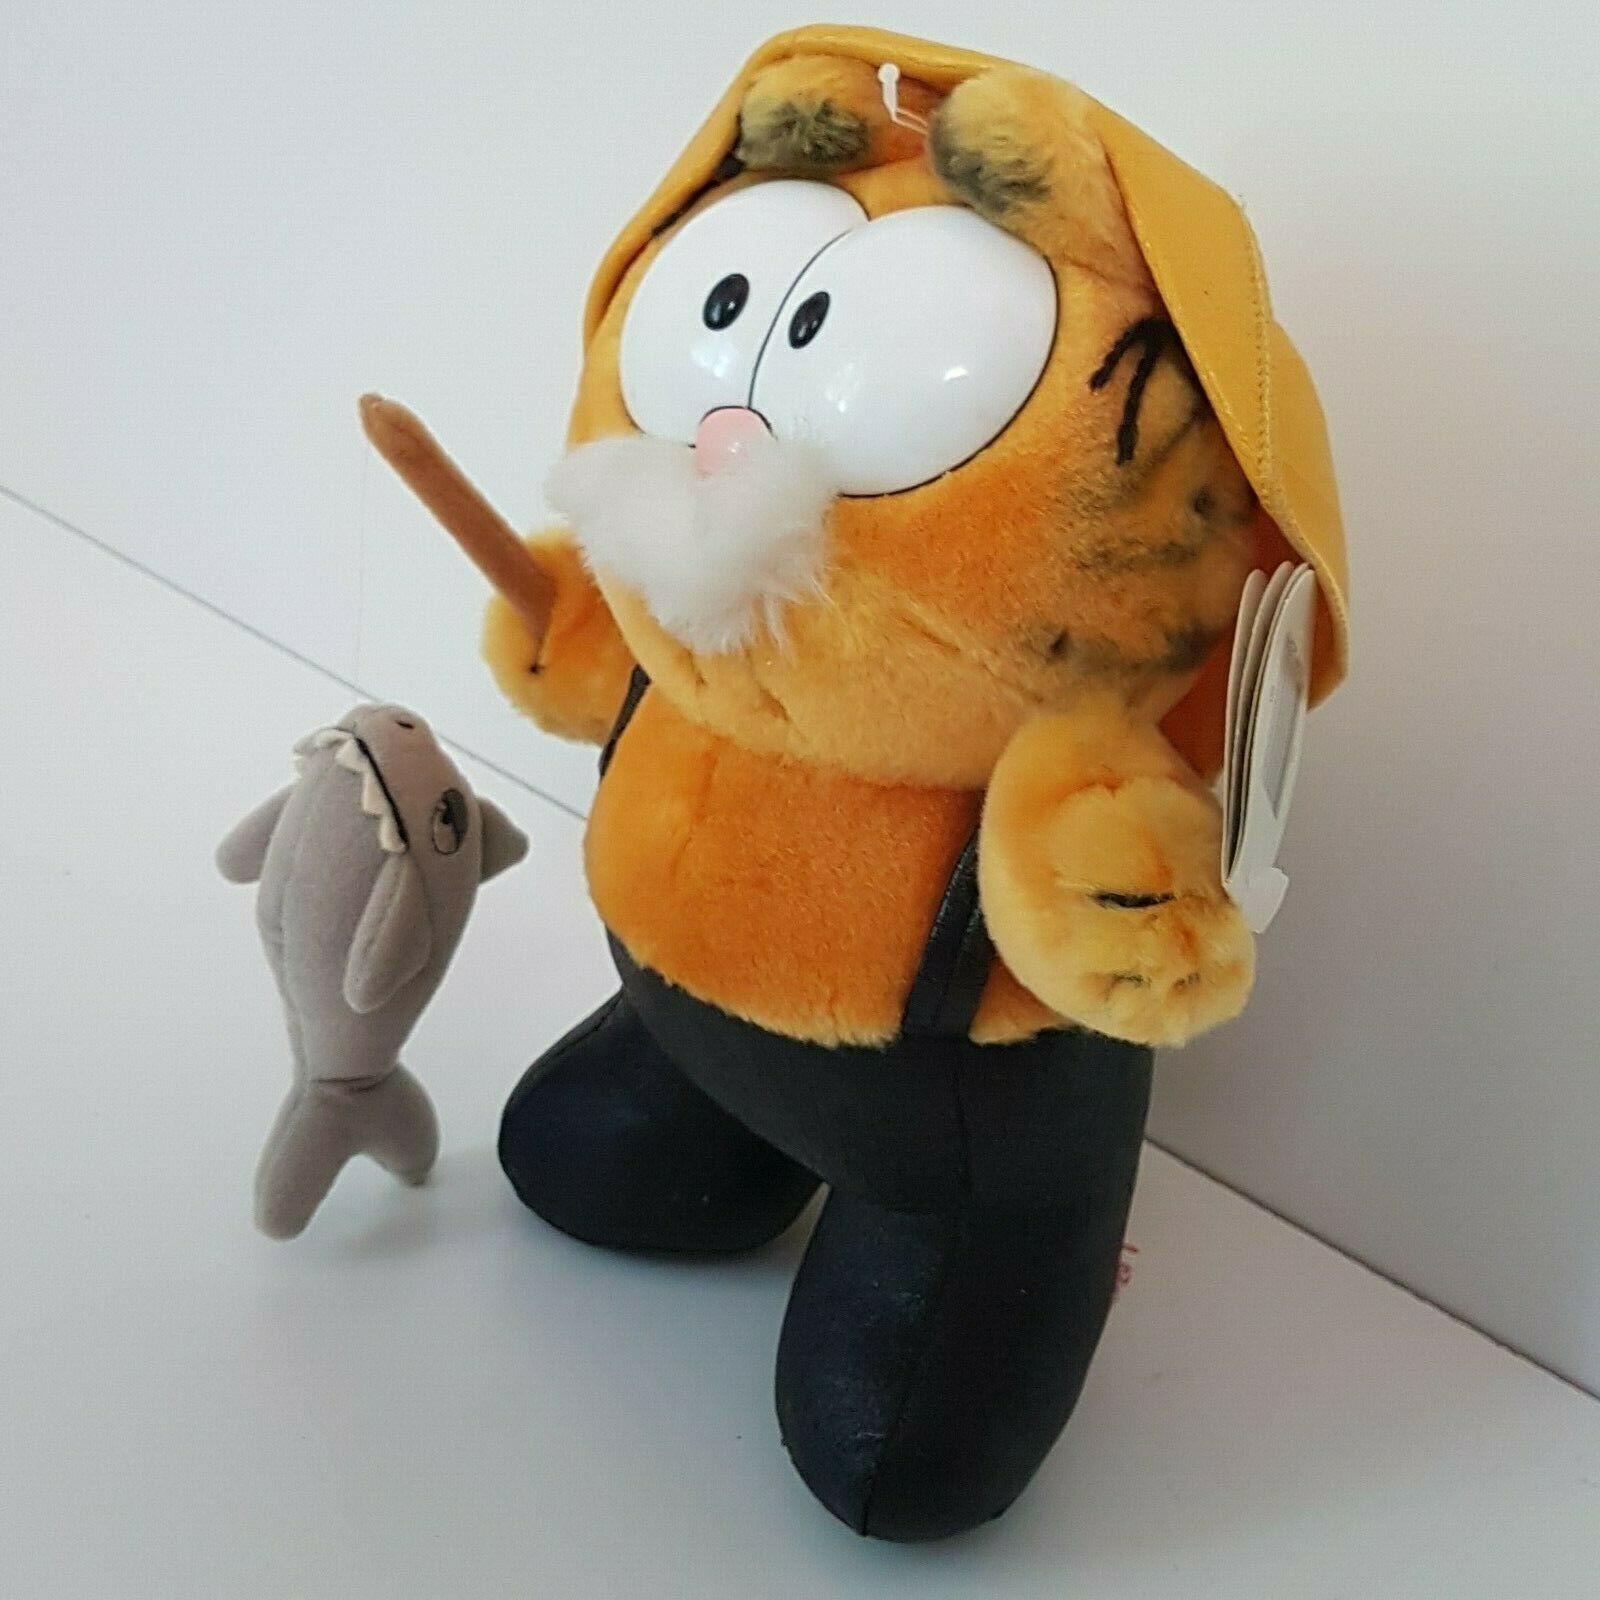 Vintage Garfield And Company Big Catch Plush Fisherman Fishing Toy Tags Dakin Ebay Vintage Toys Garfield Halloween Halloween Toys